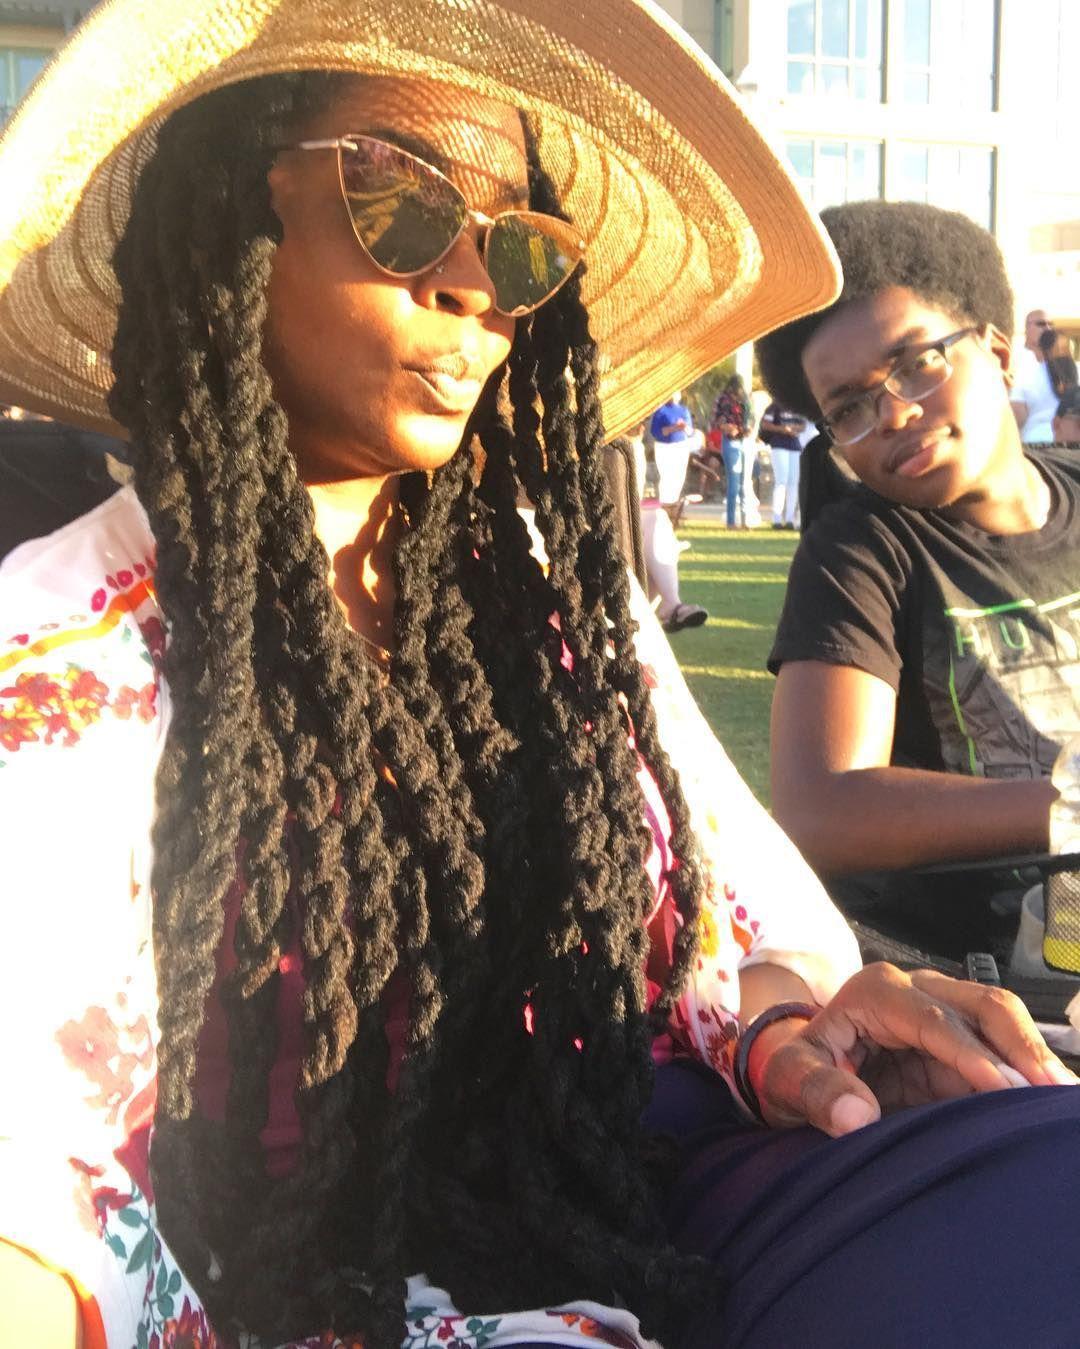 Sunshine and dreadlocks #aboutlastnight #potd #beachfun #virginiabeach #ootd #dreads #iamlocd #womenwithlocs #locs #longhairdontcare #dreadhead #allnatural #naturalhair #nomakeup #foe #family #virginiaisforlovers #summer @sunglassspot